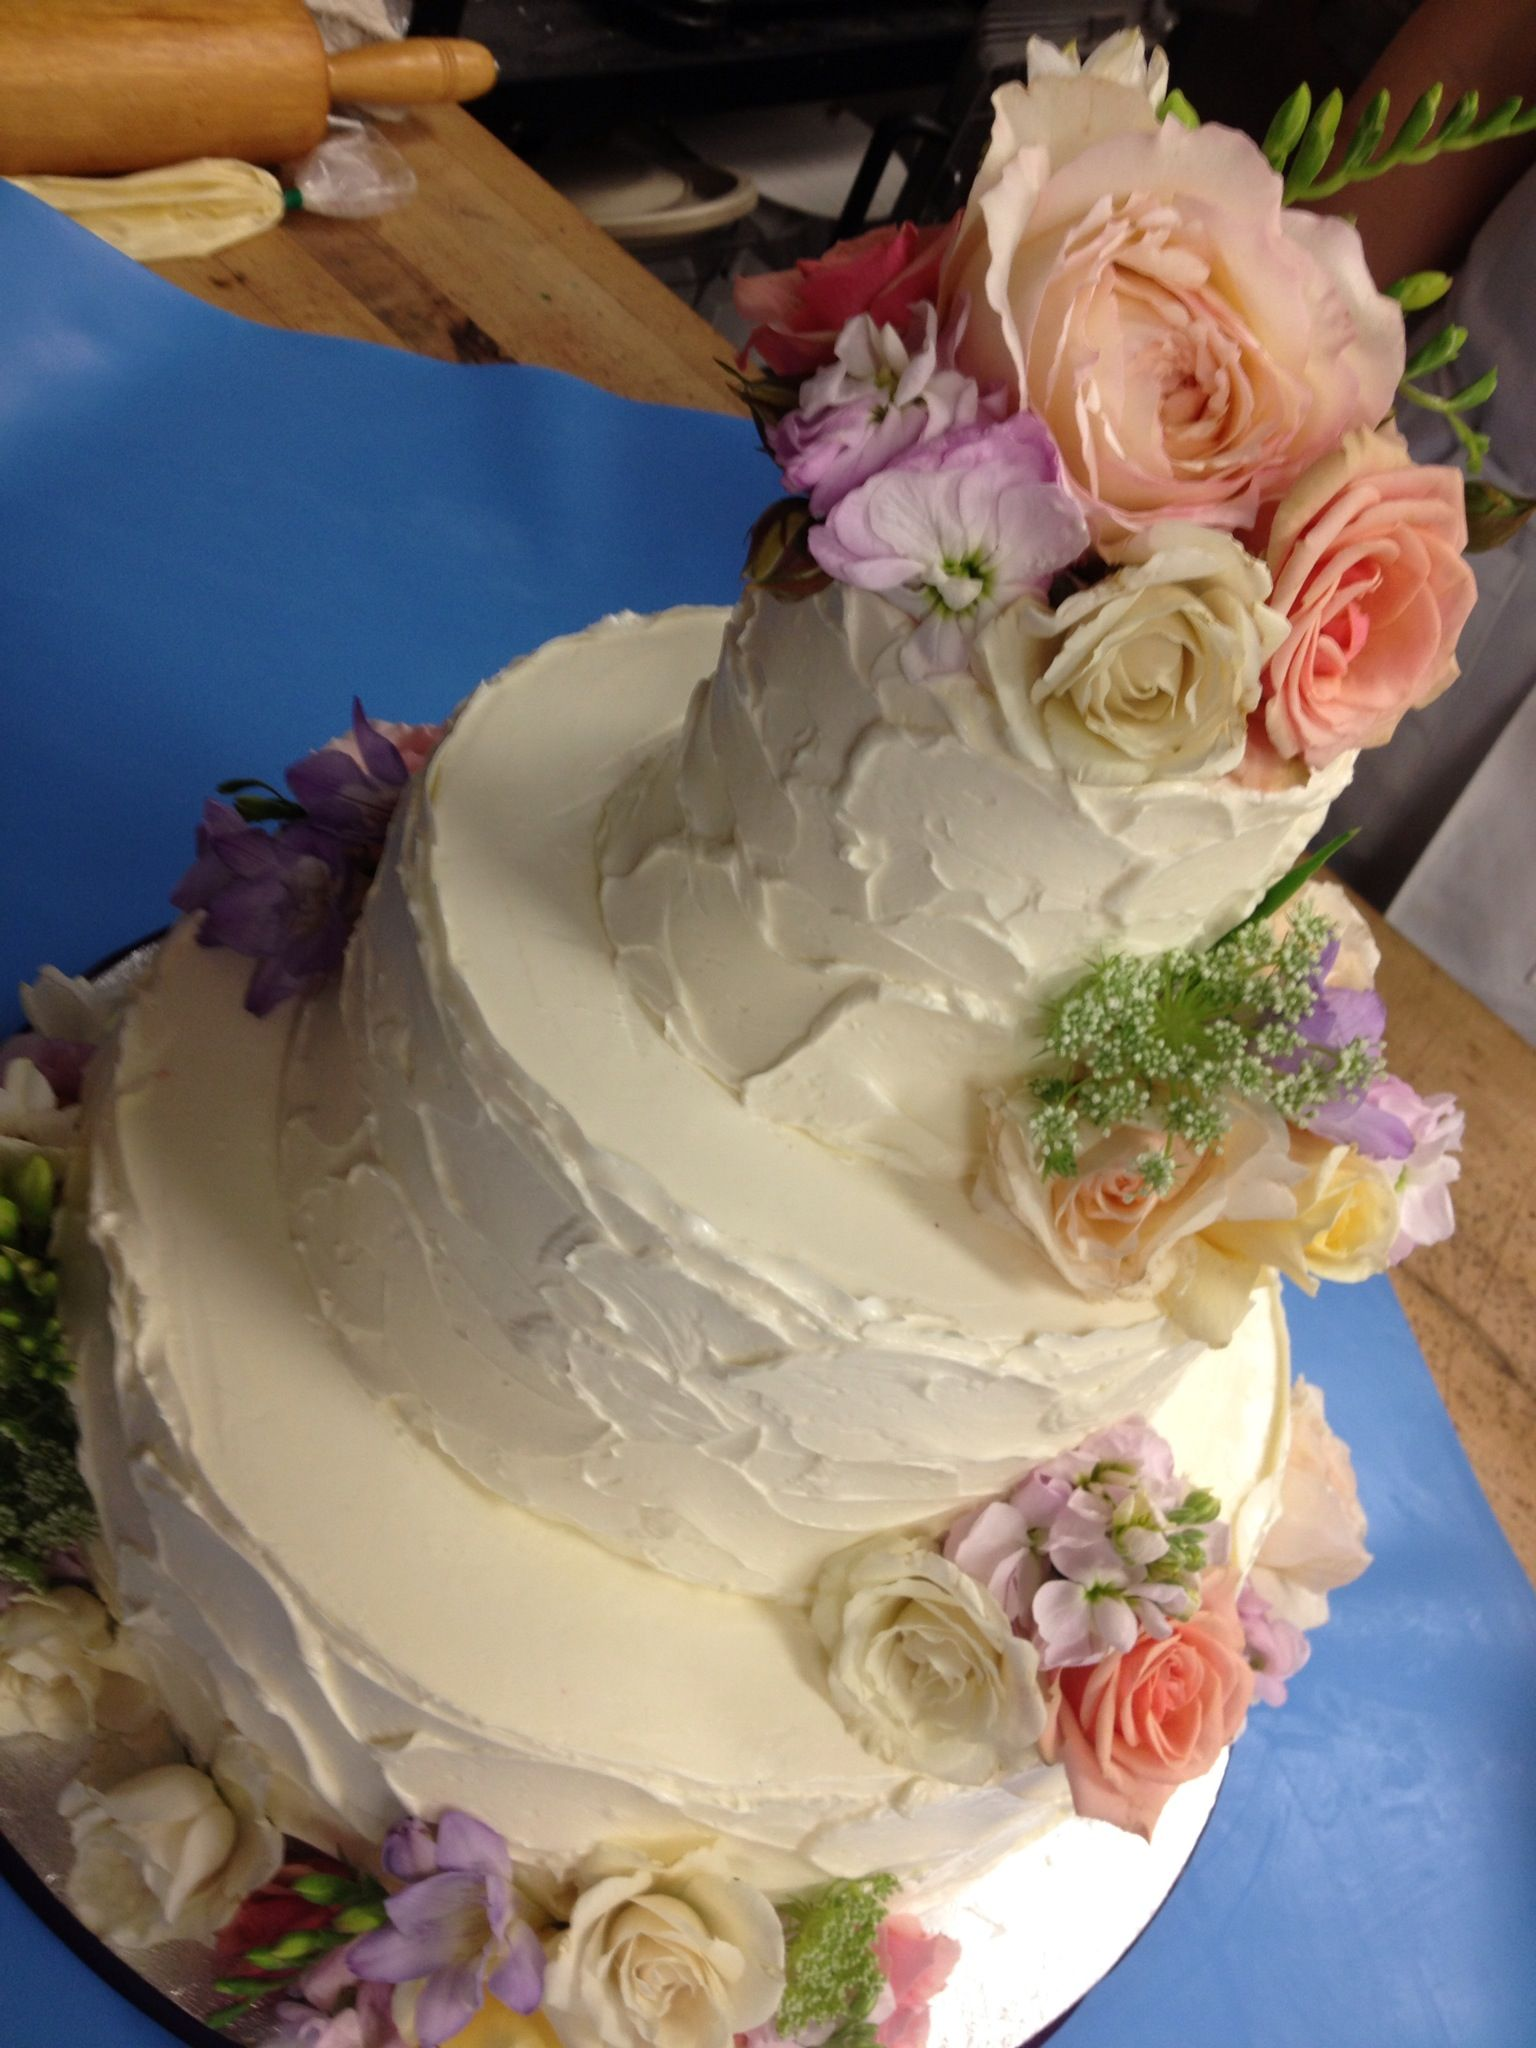 By Reva Alexander Hawk Swiss Meringue Ercream Cake With Fresh Flowers Rustic Wedding